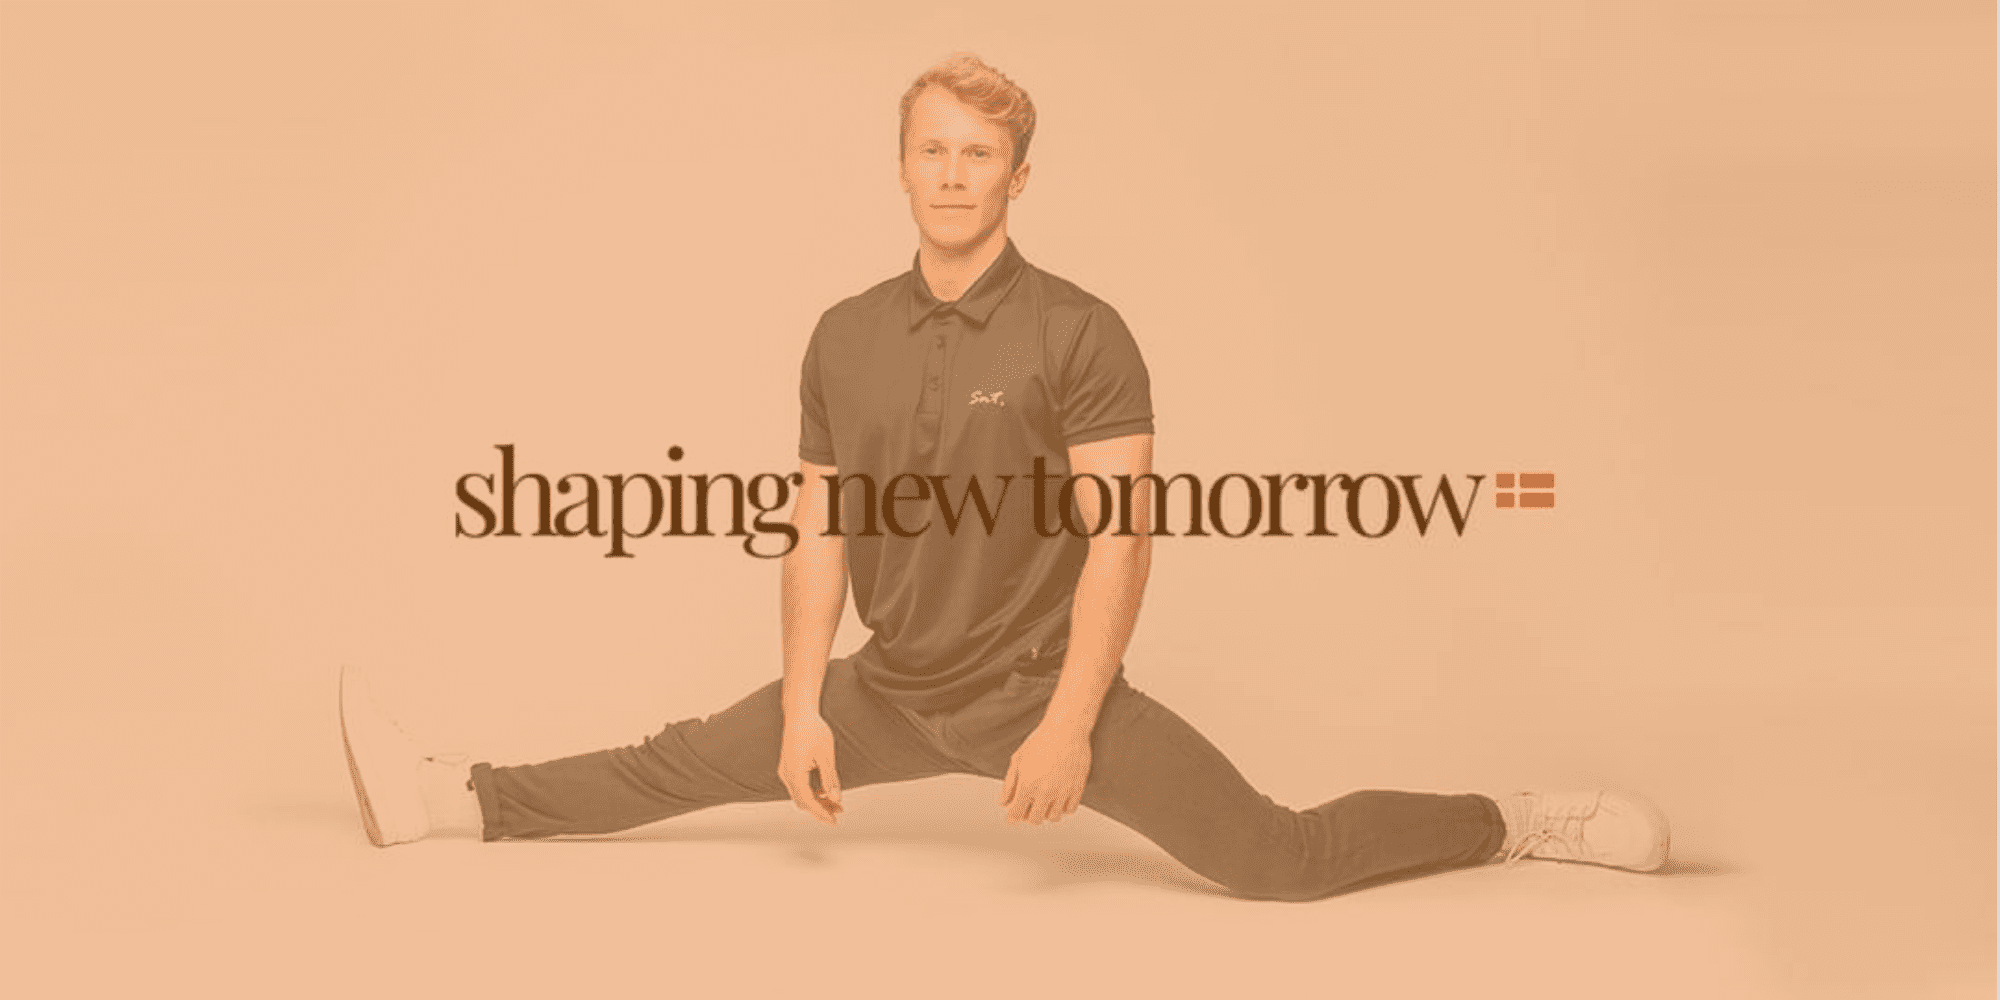 Shaping New Tomorrow